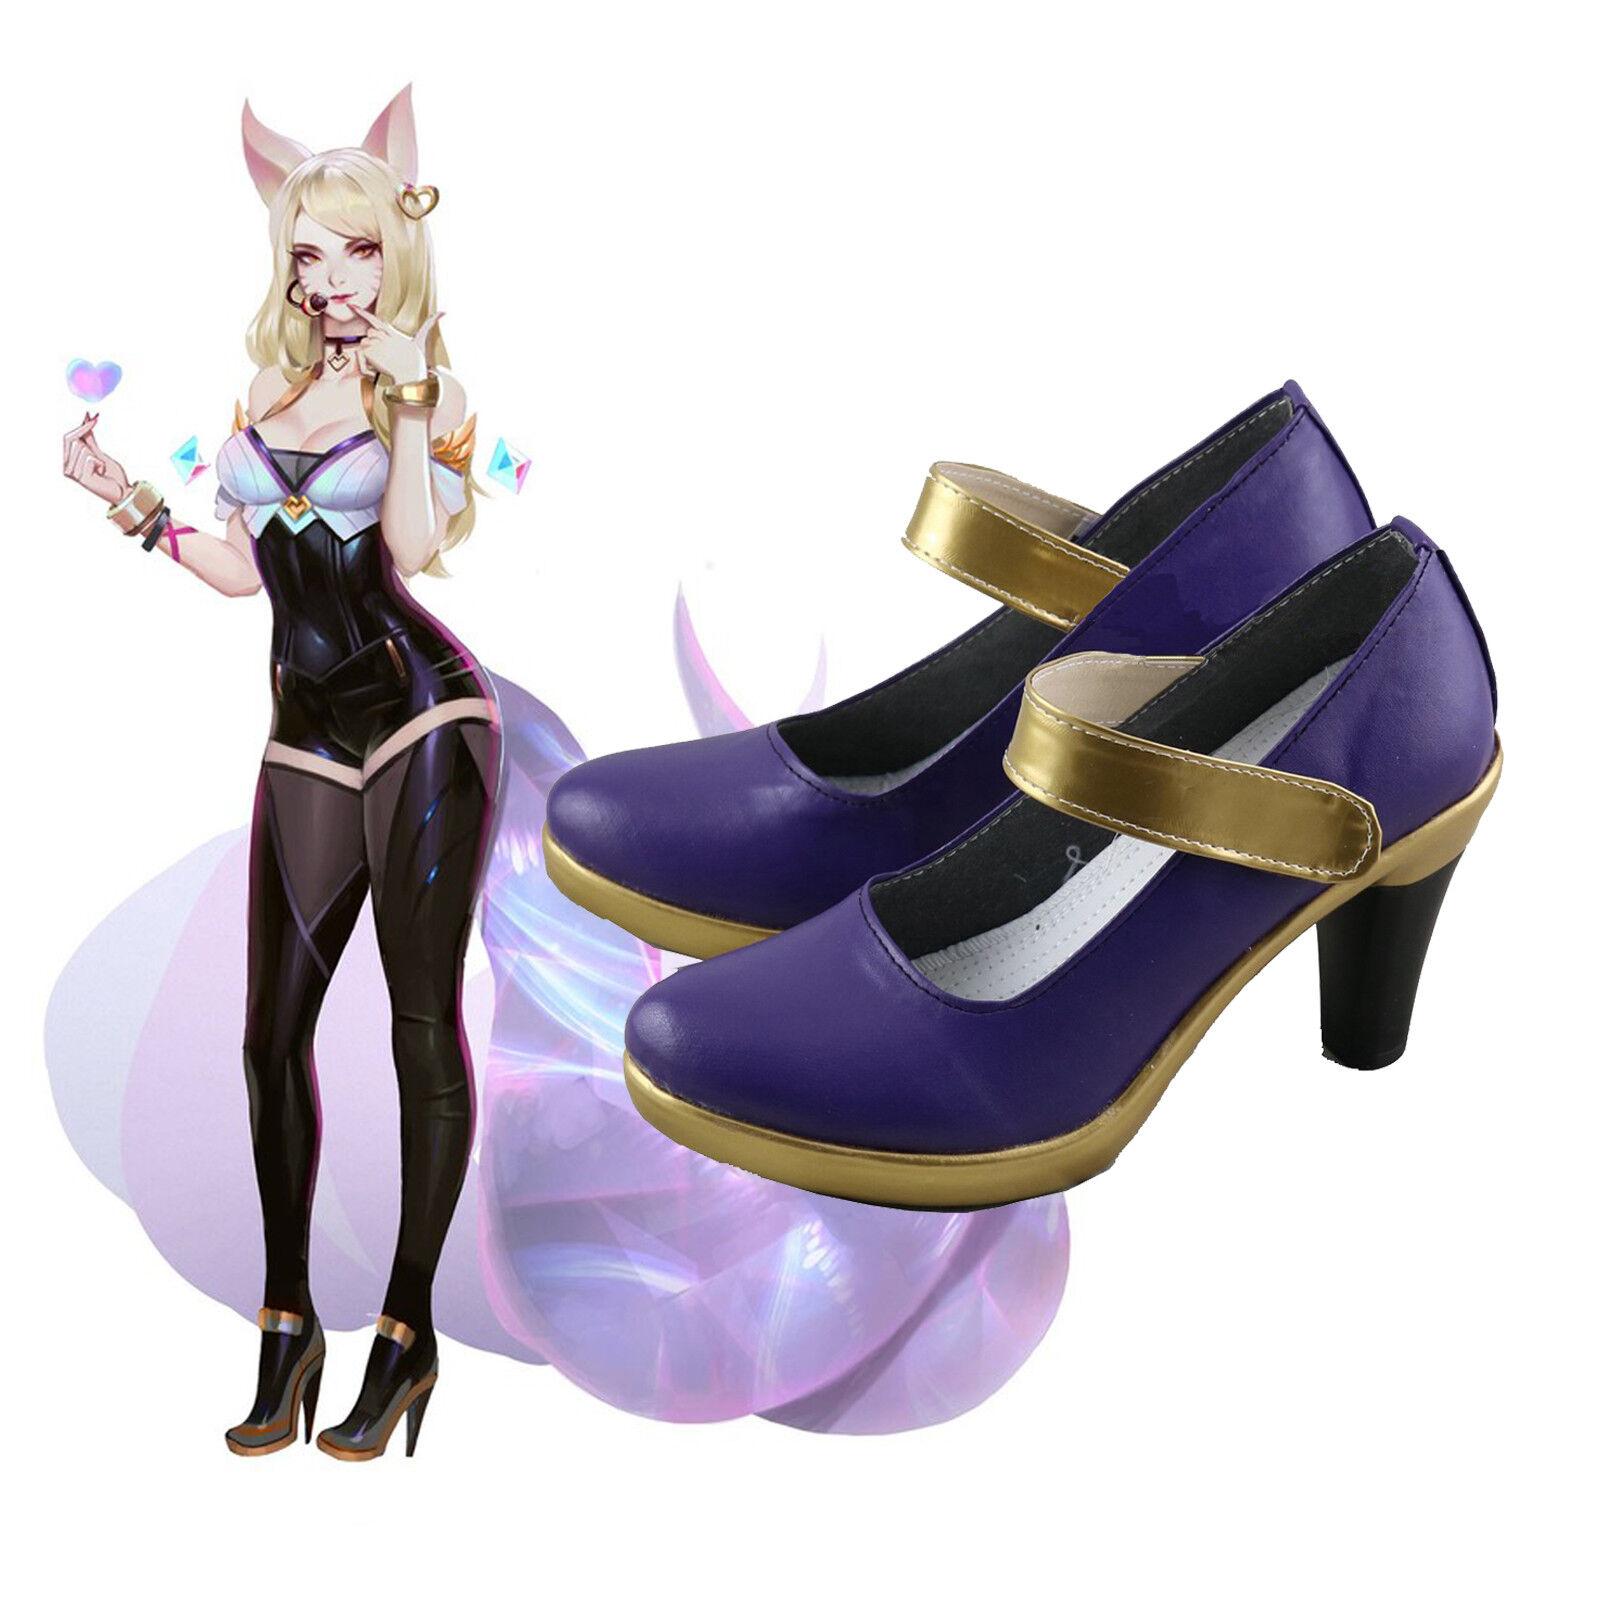 New LOL League of Legends KDA Ahri Prestige Cosplay Shoes Heel Boots Custom Made